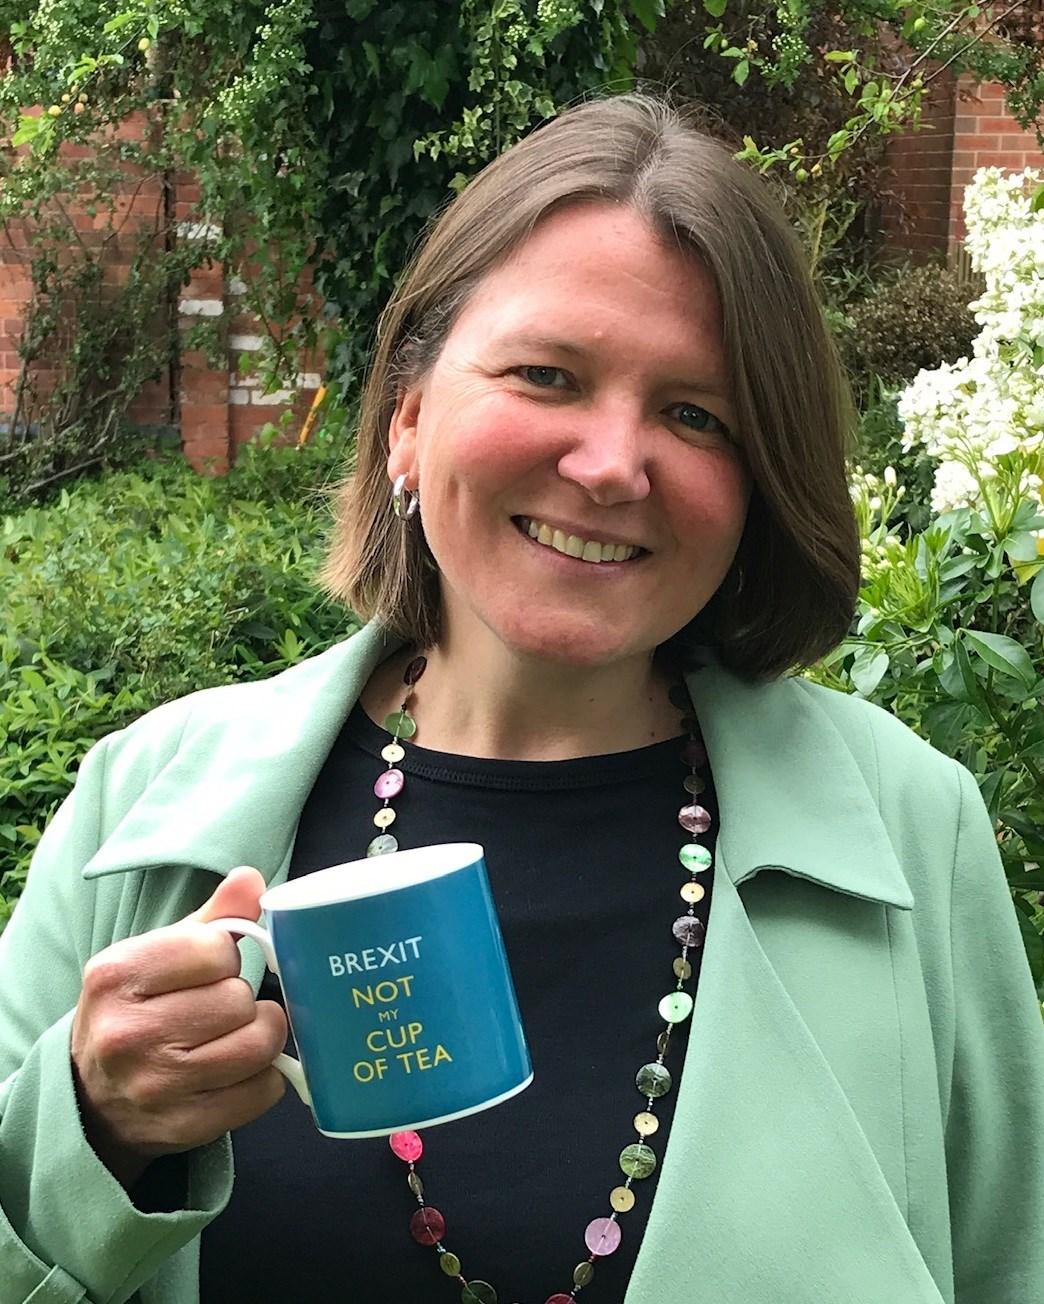 Ellie Chowns with EU mug